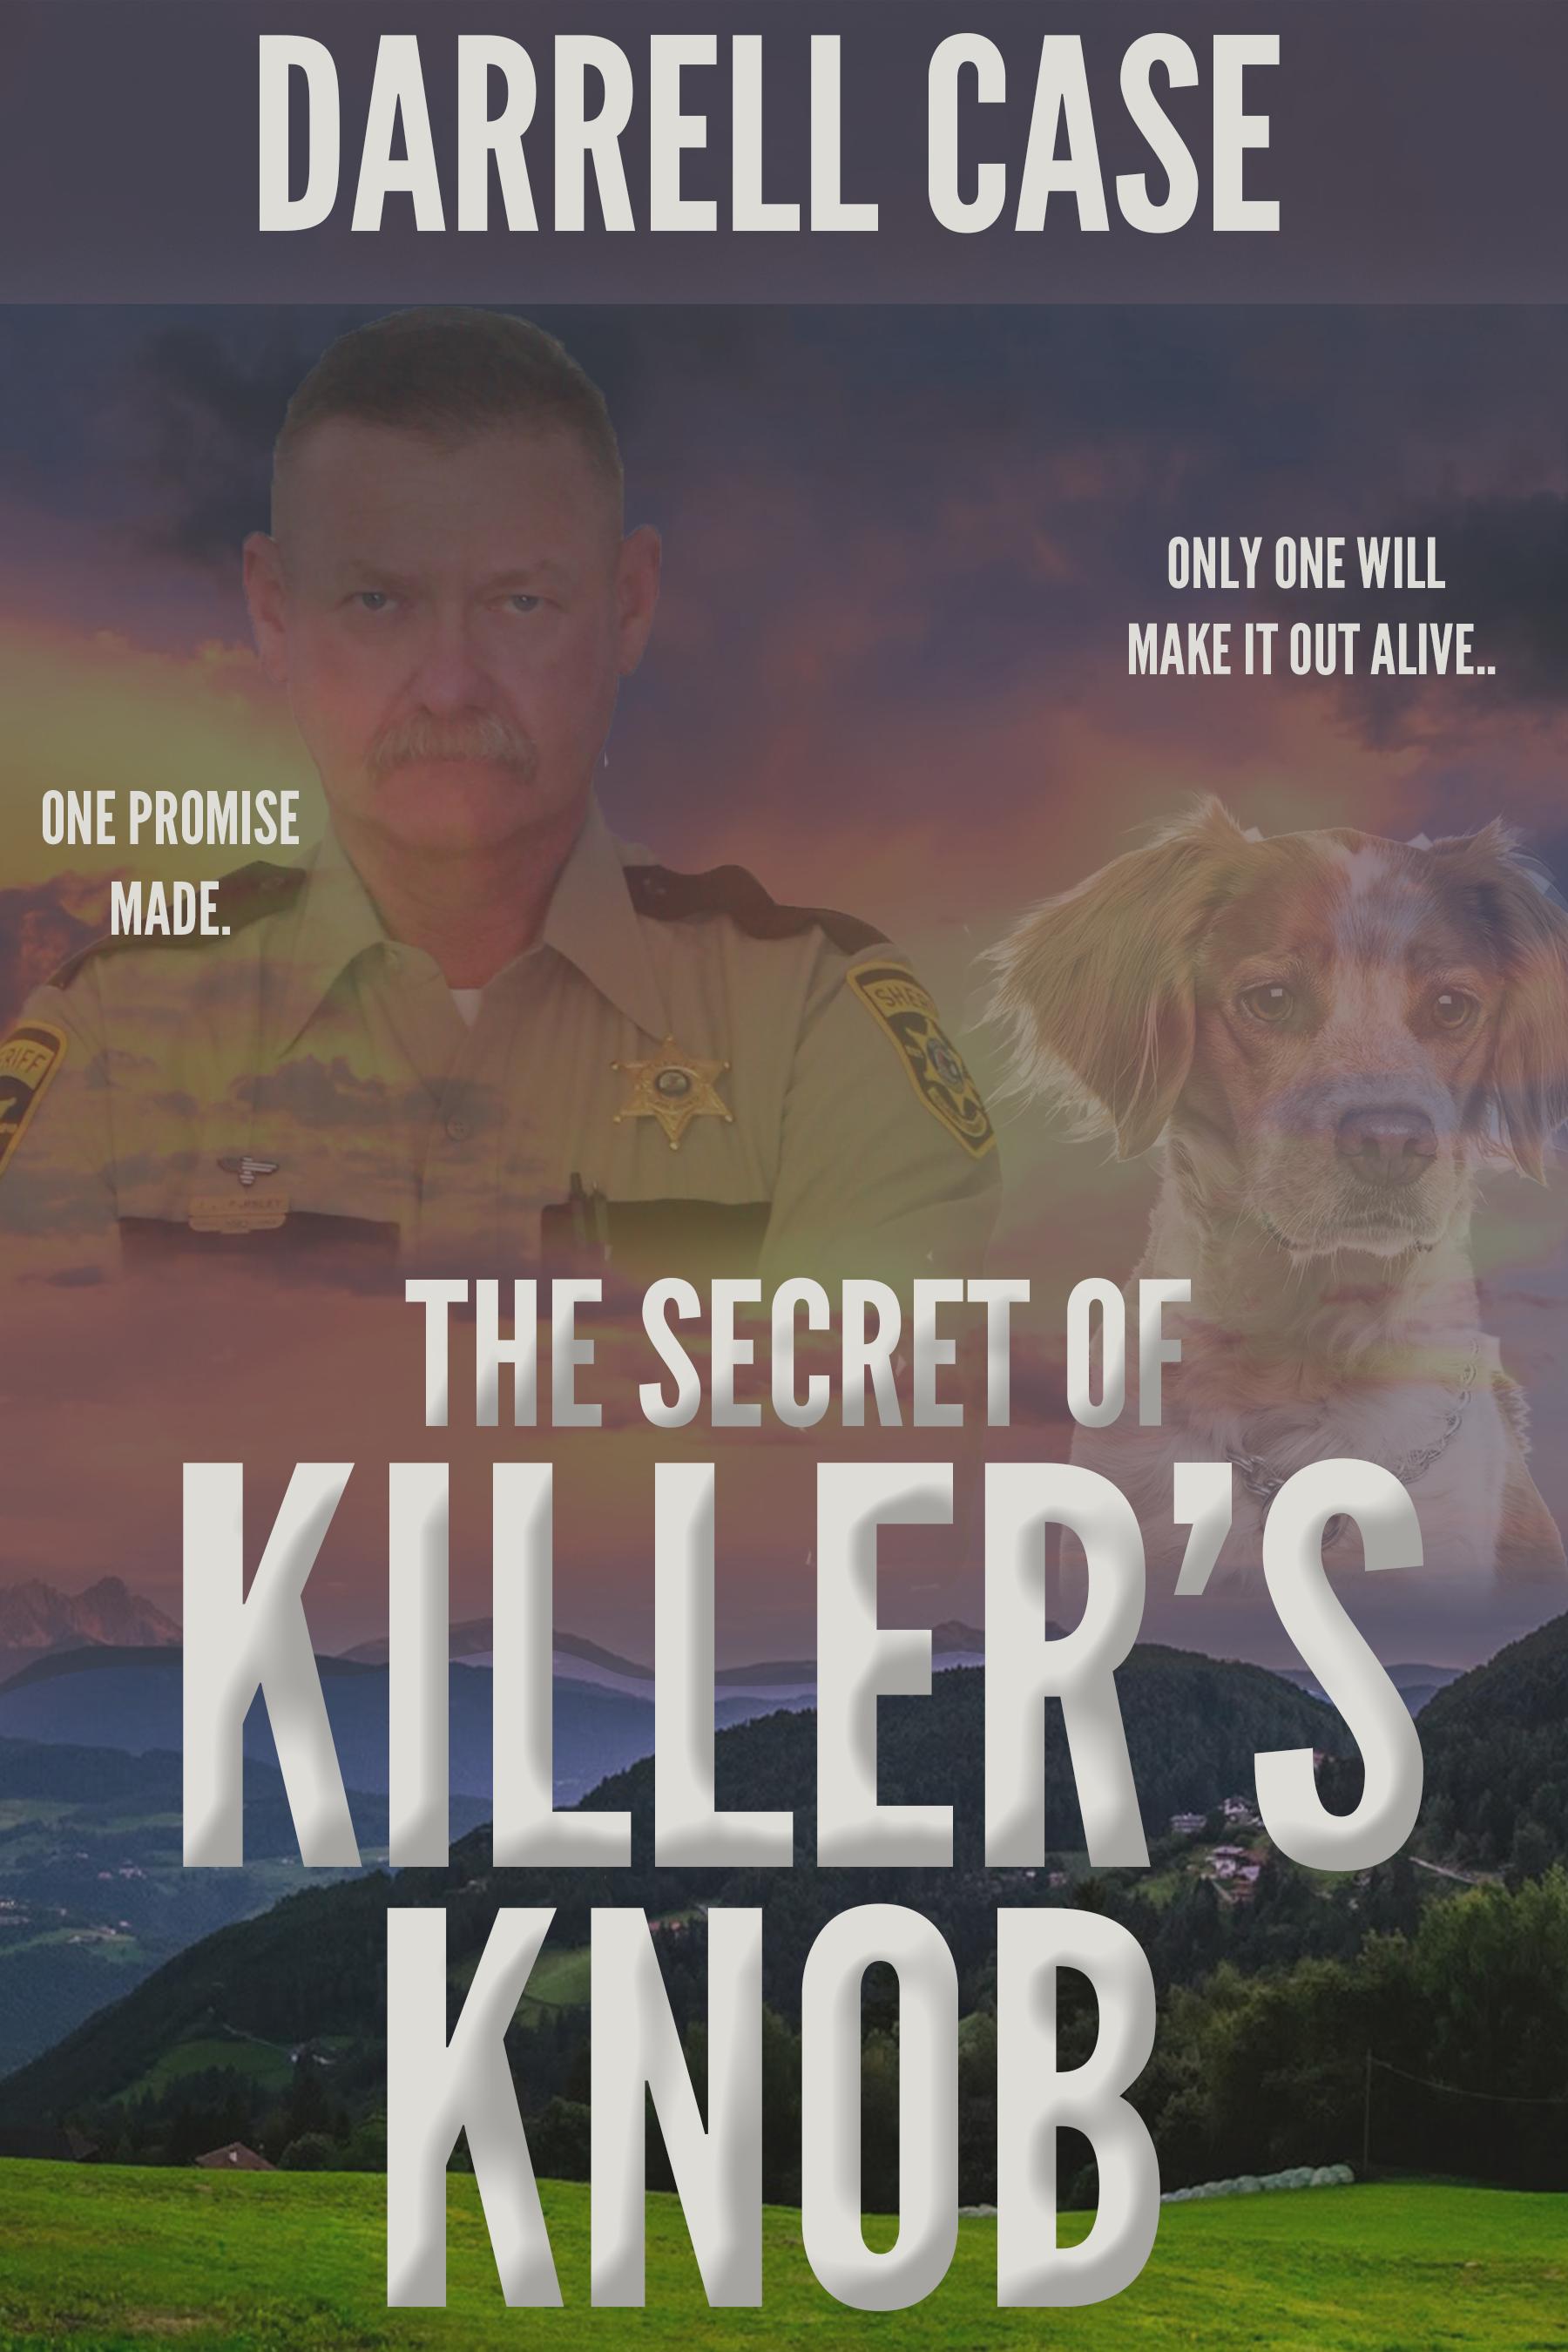 The Secret of Killers Knob